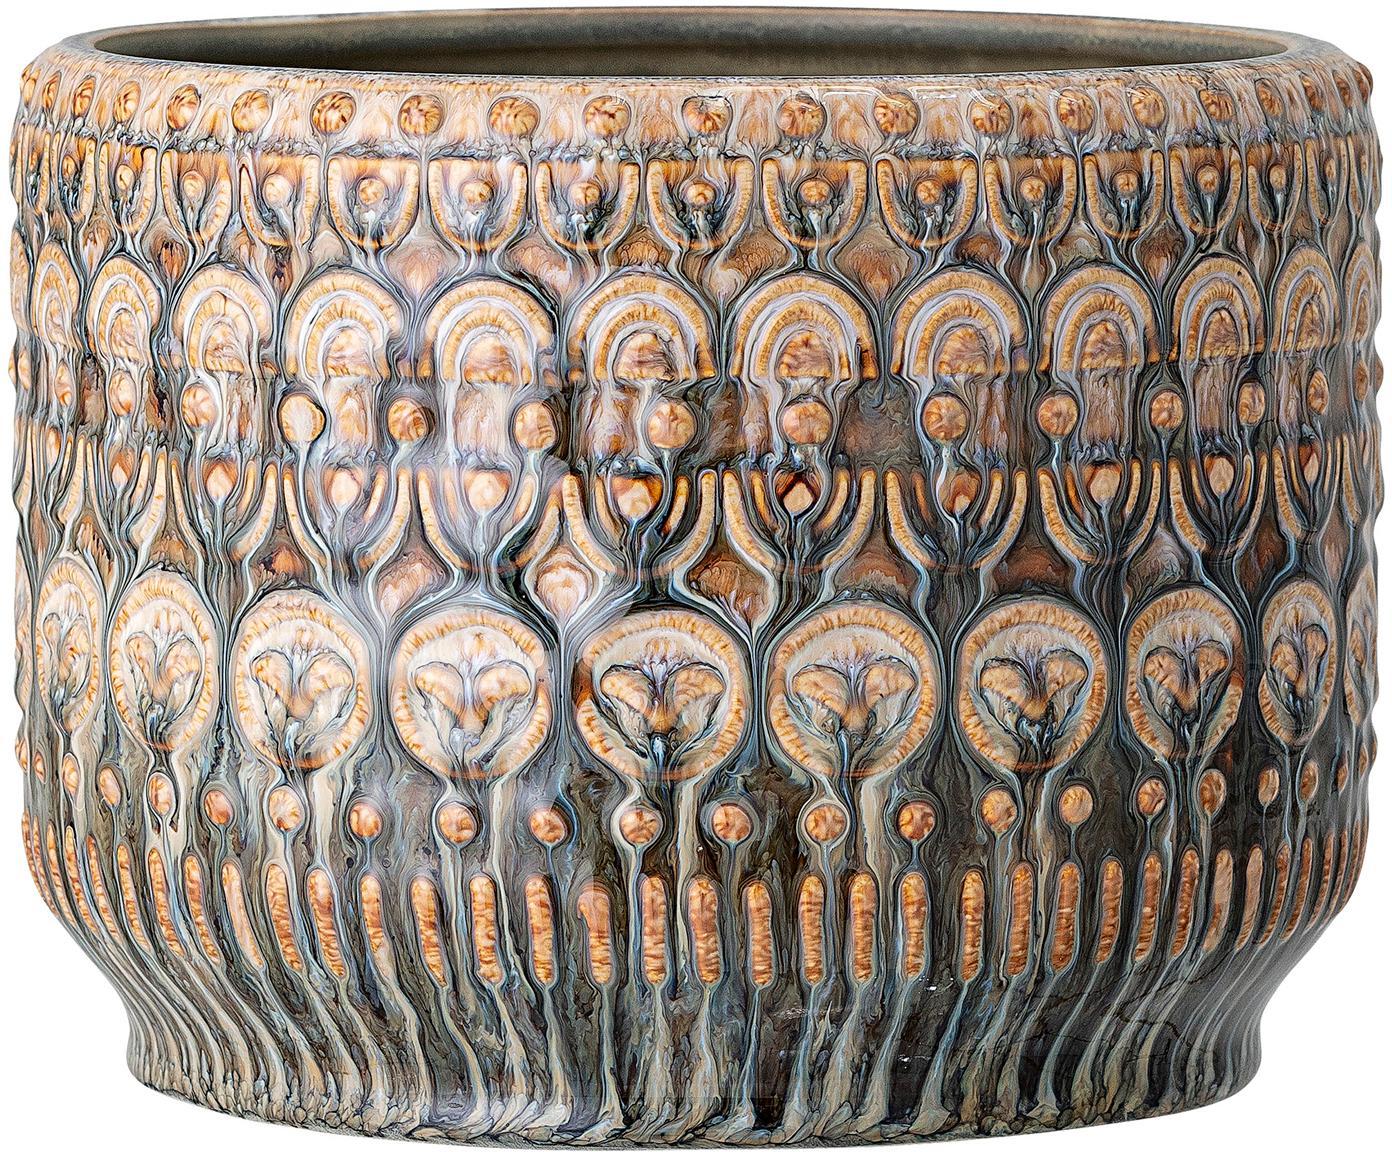 Handgefertigter Übertopf Finka, Steingut, Grüntöne, Orange, Ø 20 x H 15 cm